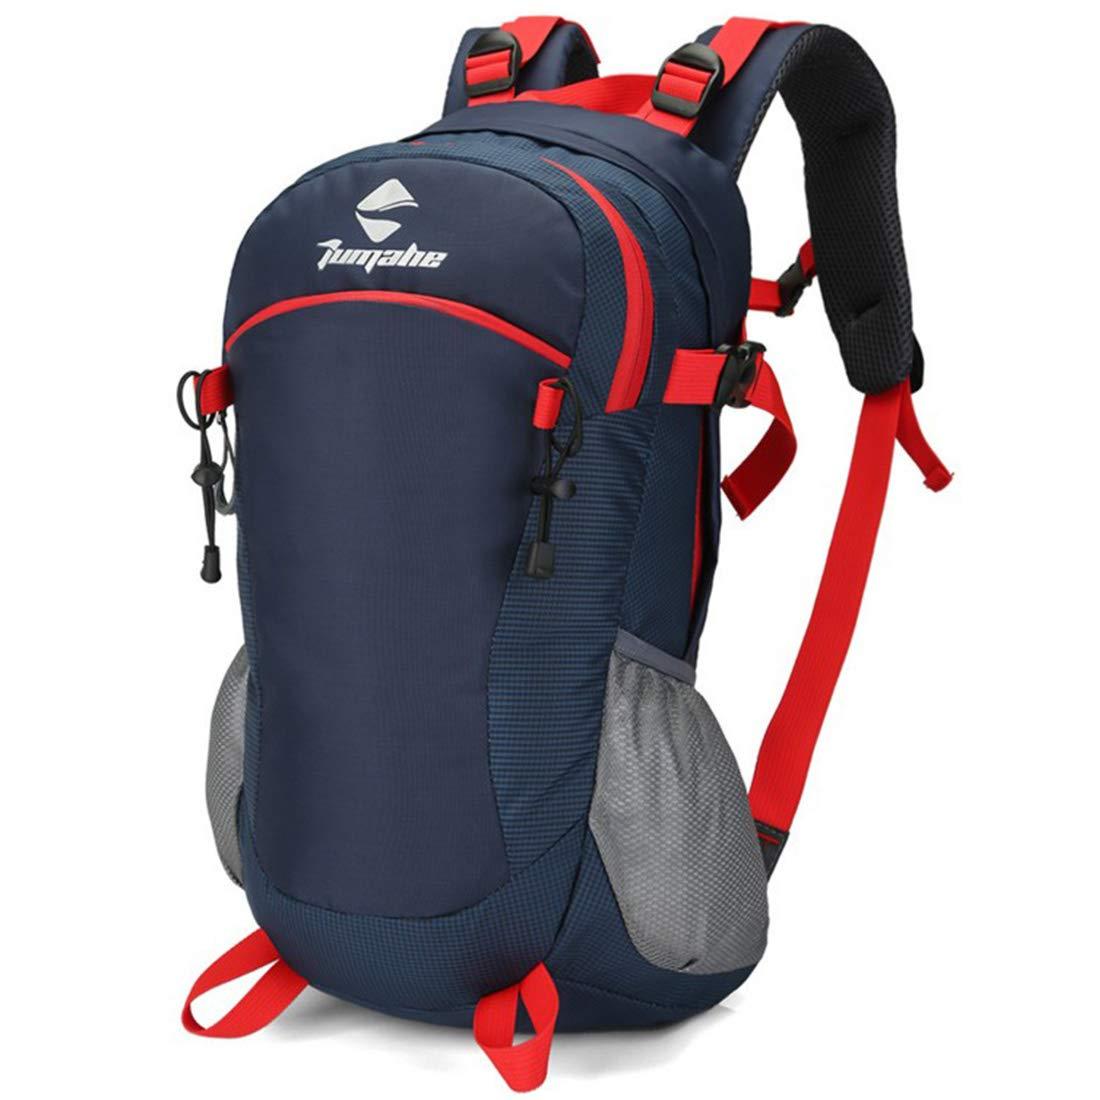 Kunliyin YY1 Wasserdichte Oxford-Bergsteigertasche (Farbe : Dark Blau)